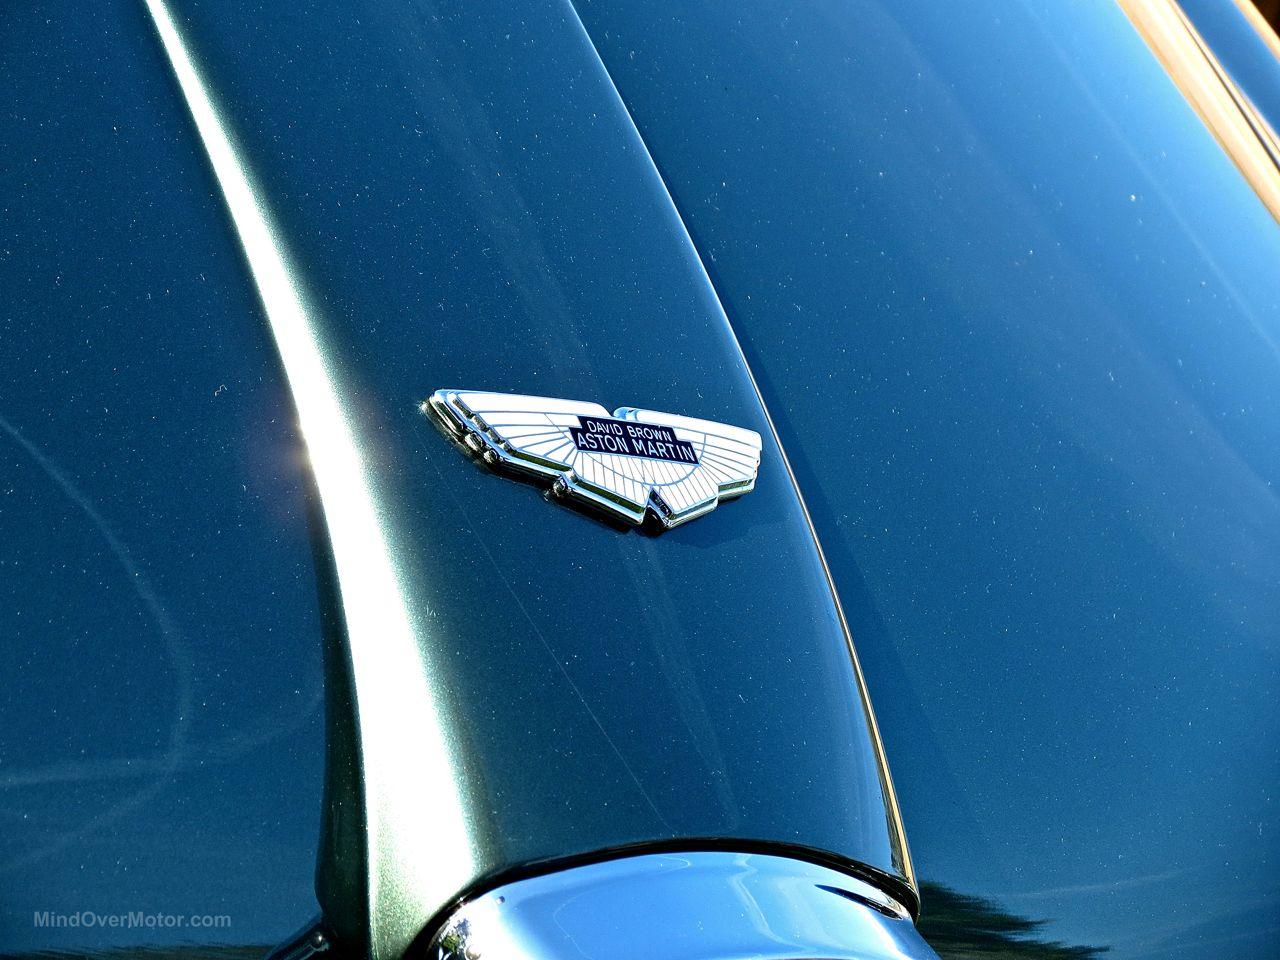 Aston Martin DB4 GT Zagato Amelia Island 15